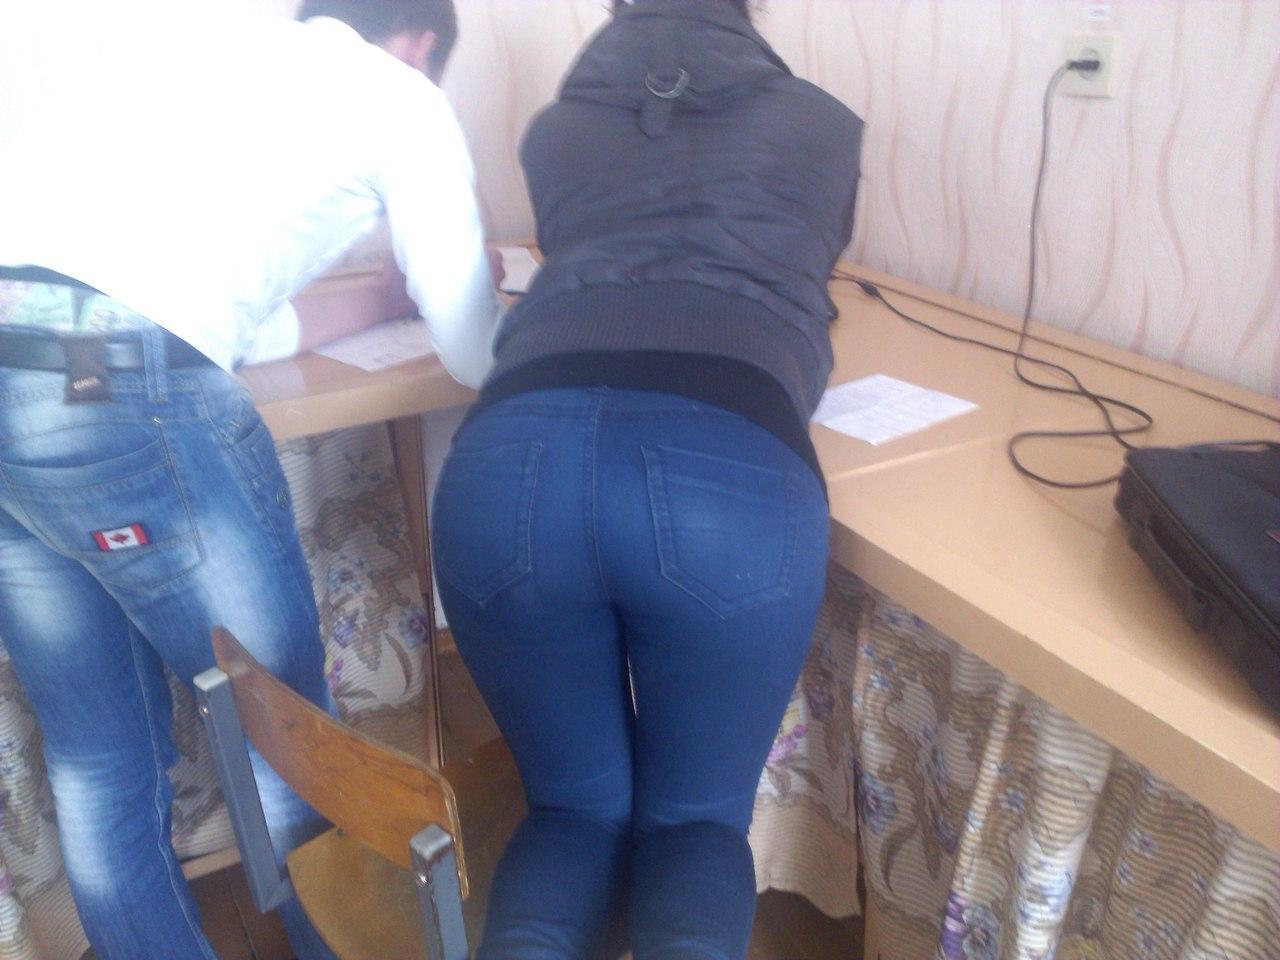 Фото попок одноклассниц, Сочные Жопы Одноклассниц ВКонтакте 21 фотография